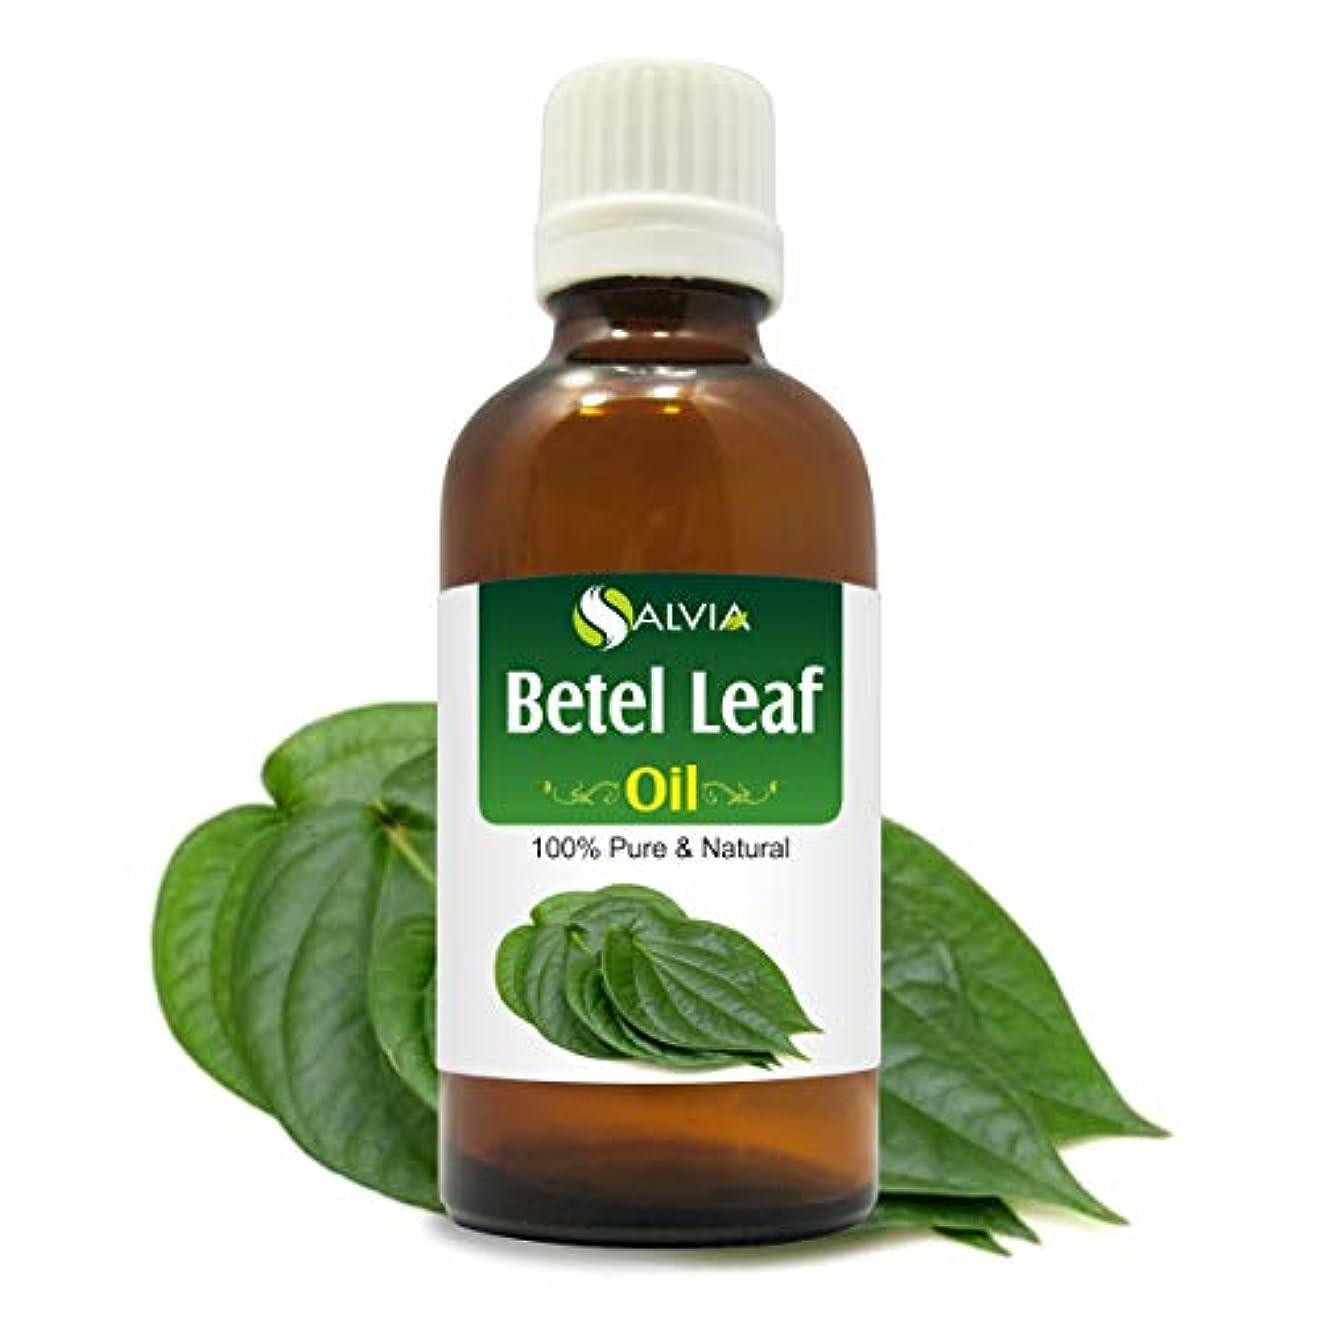 Betel Leaf Oil (Piper betle) 100% Pure & Natural - Undiluted Uncut Therapeutic Grade Essential Oil - 100 ML